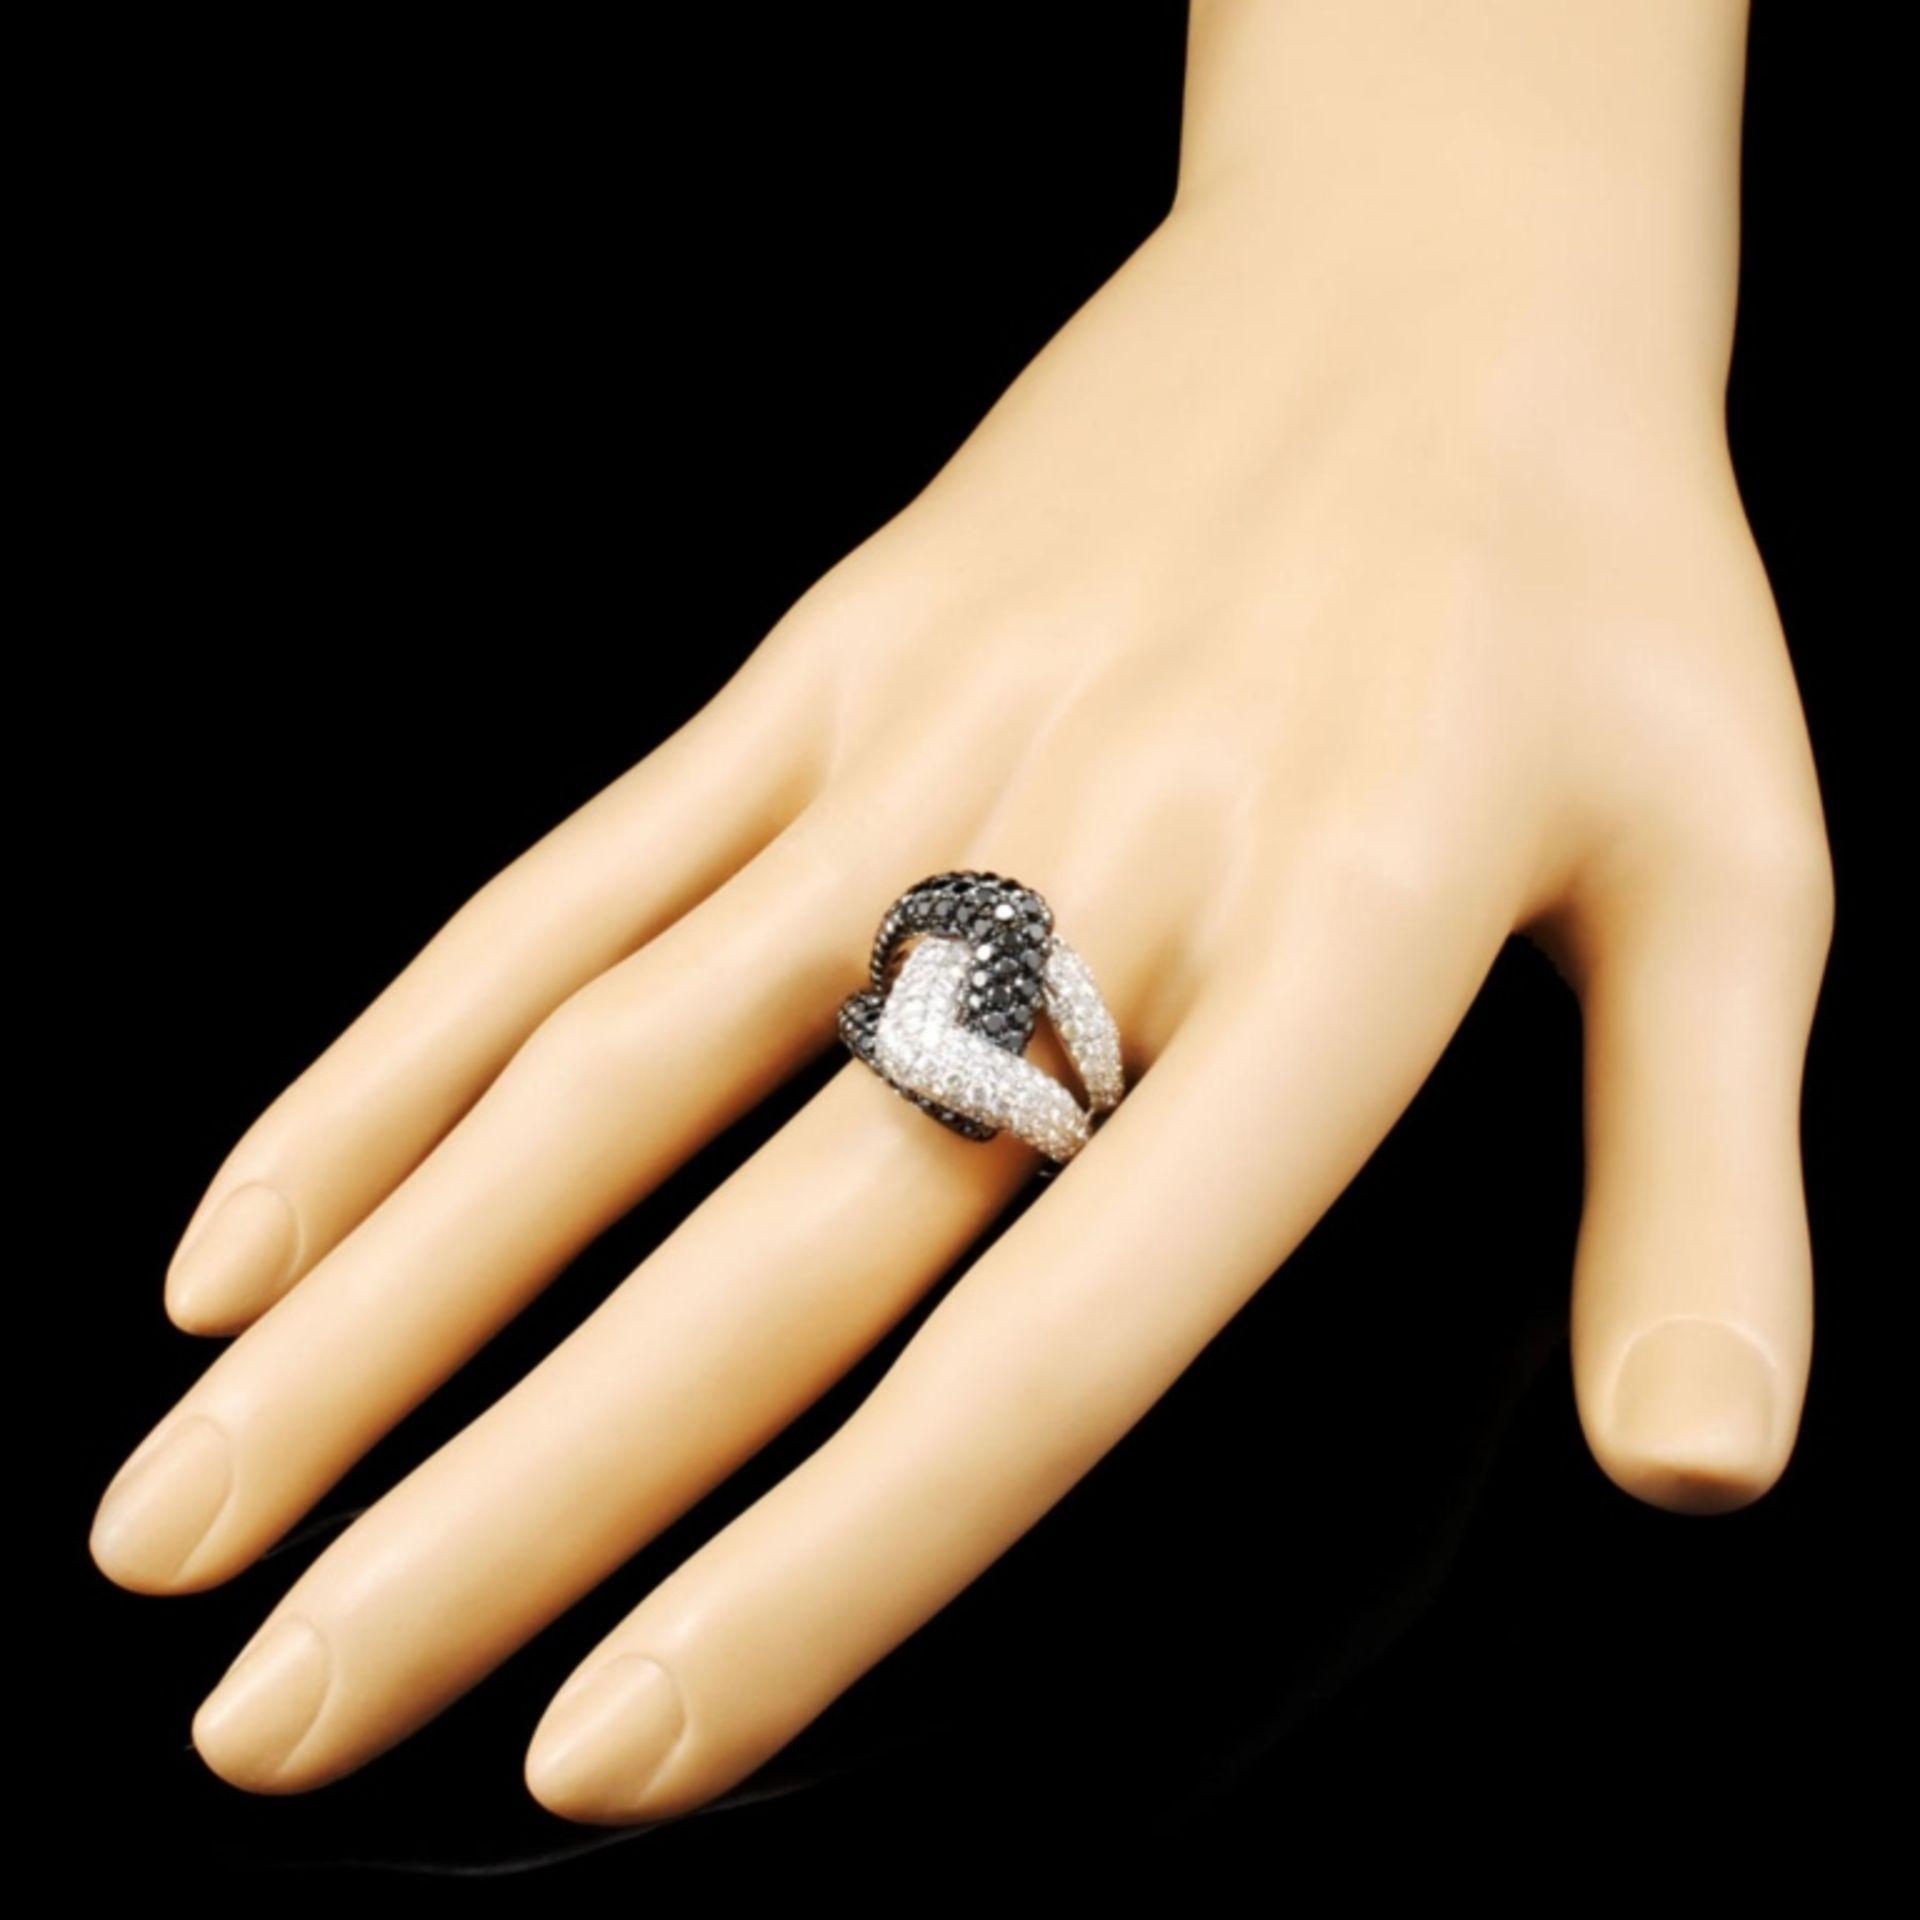 14K Gold 4.00ctw Diamond Ring - Image 3 of 5